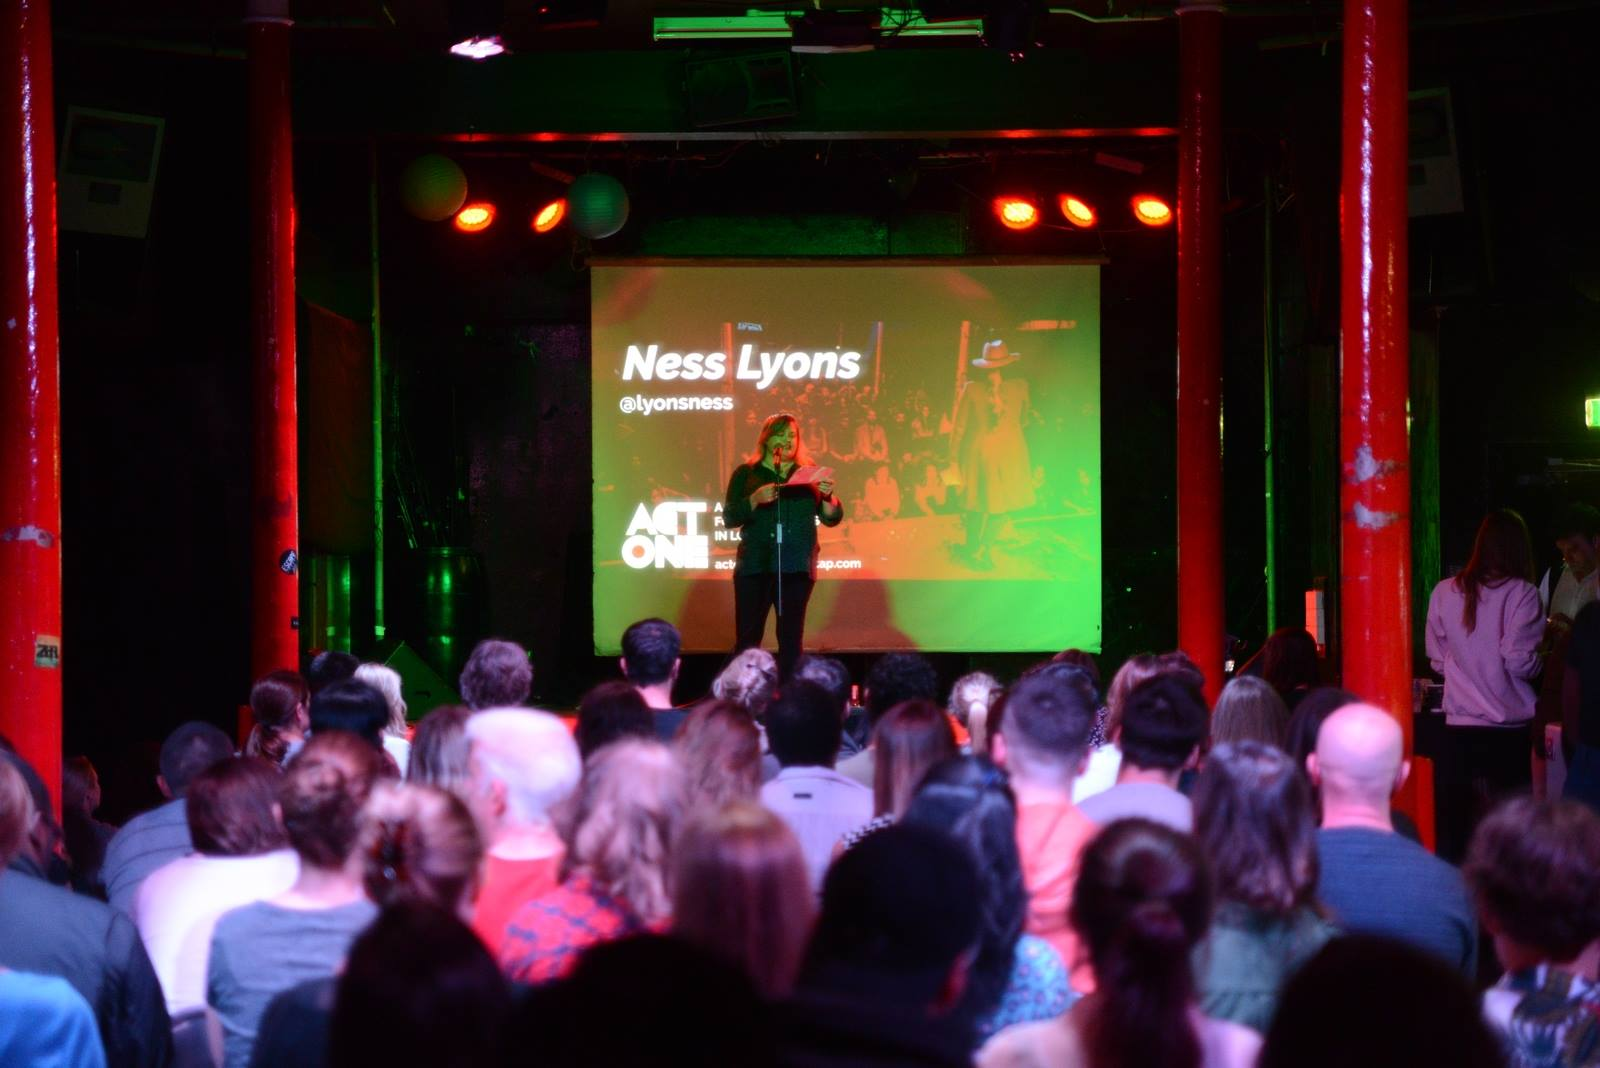 Spoken Word poetry performance for Shorts on Tap - 93 Feet East, Brick Lane